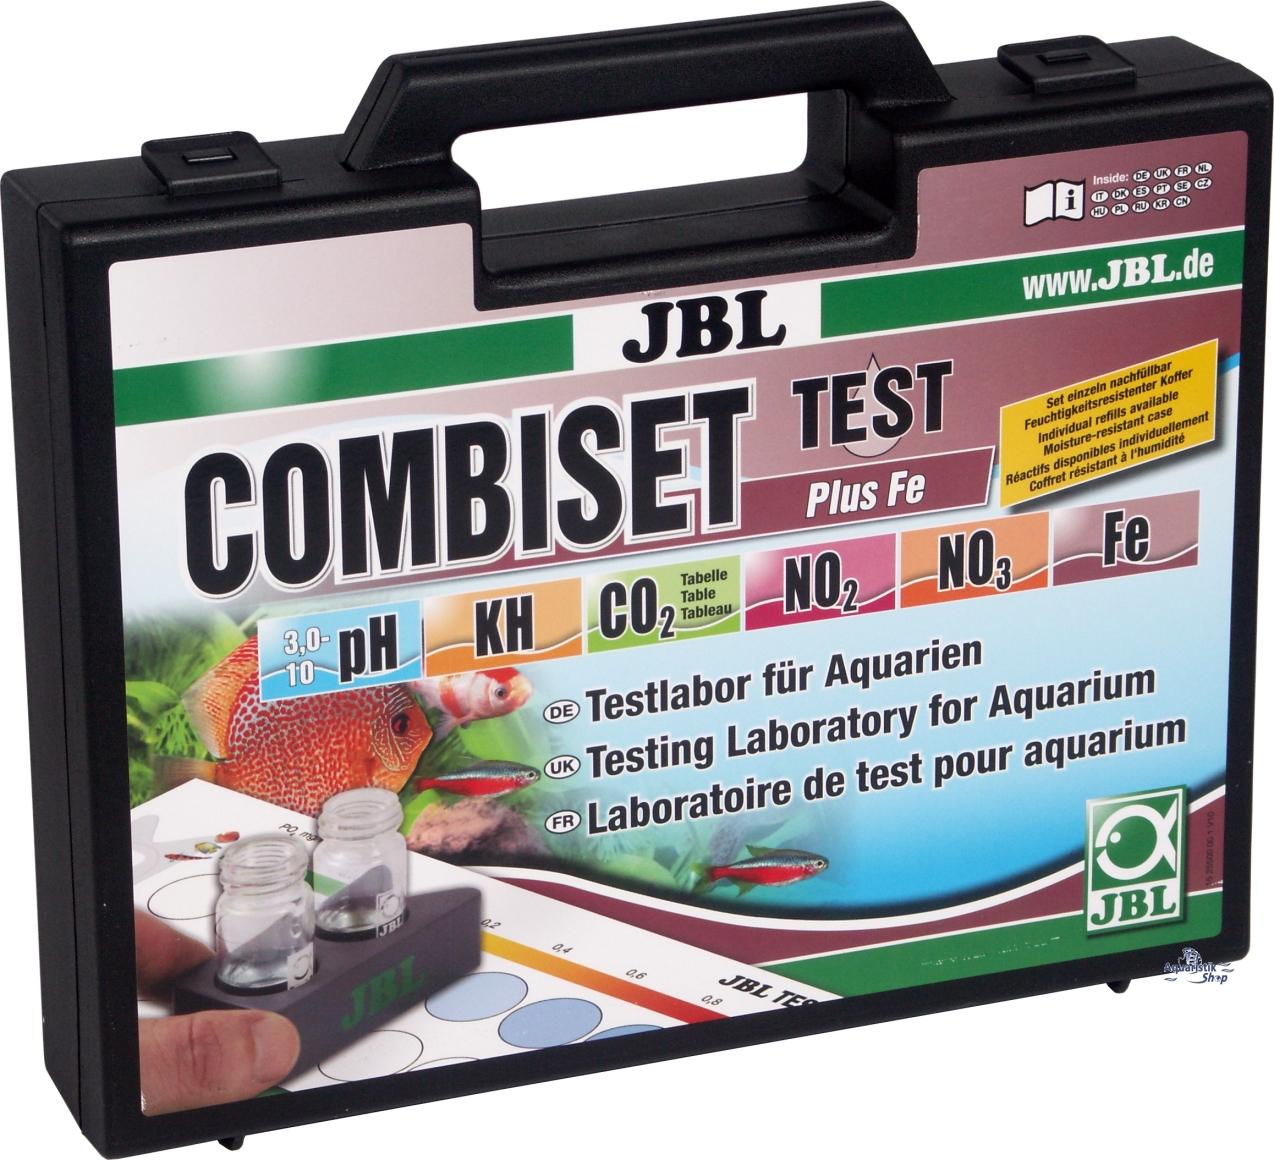 Preise JBL Test Combi-Set Plus